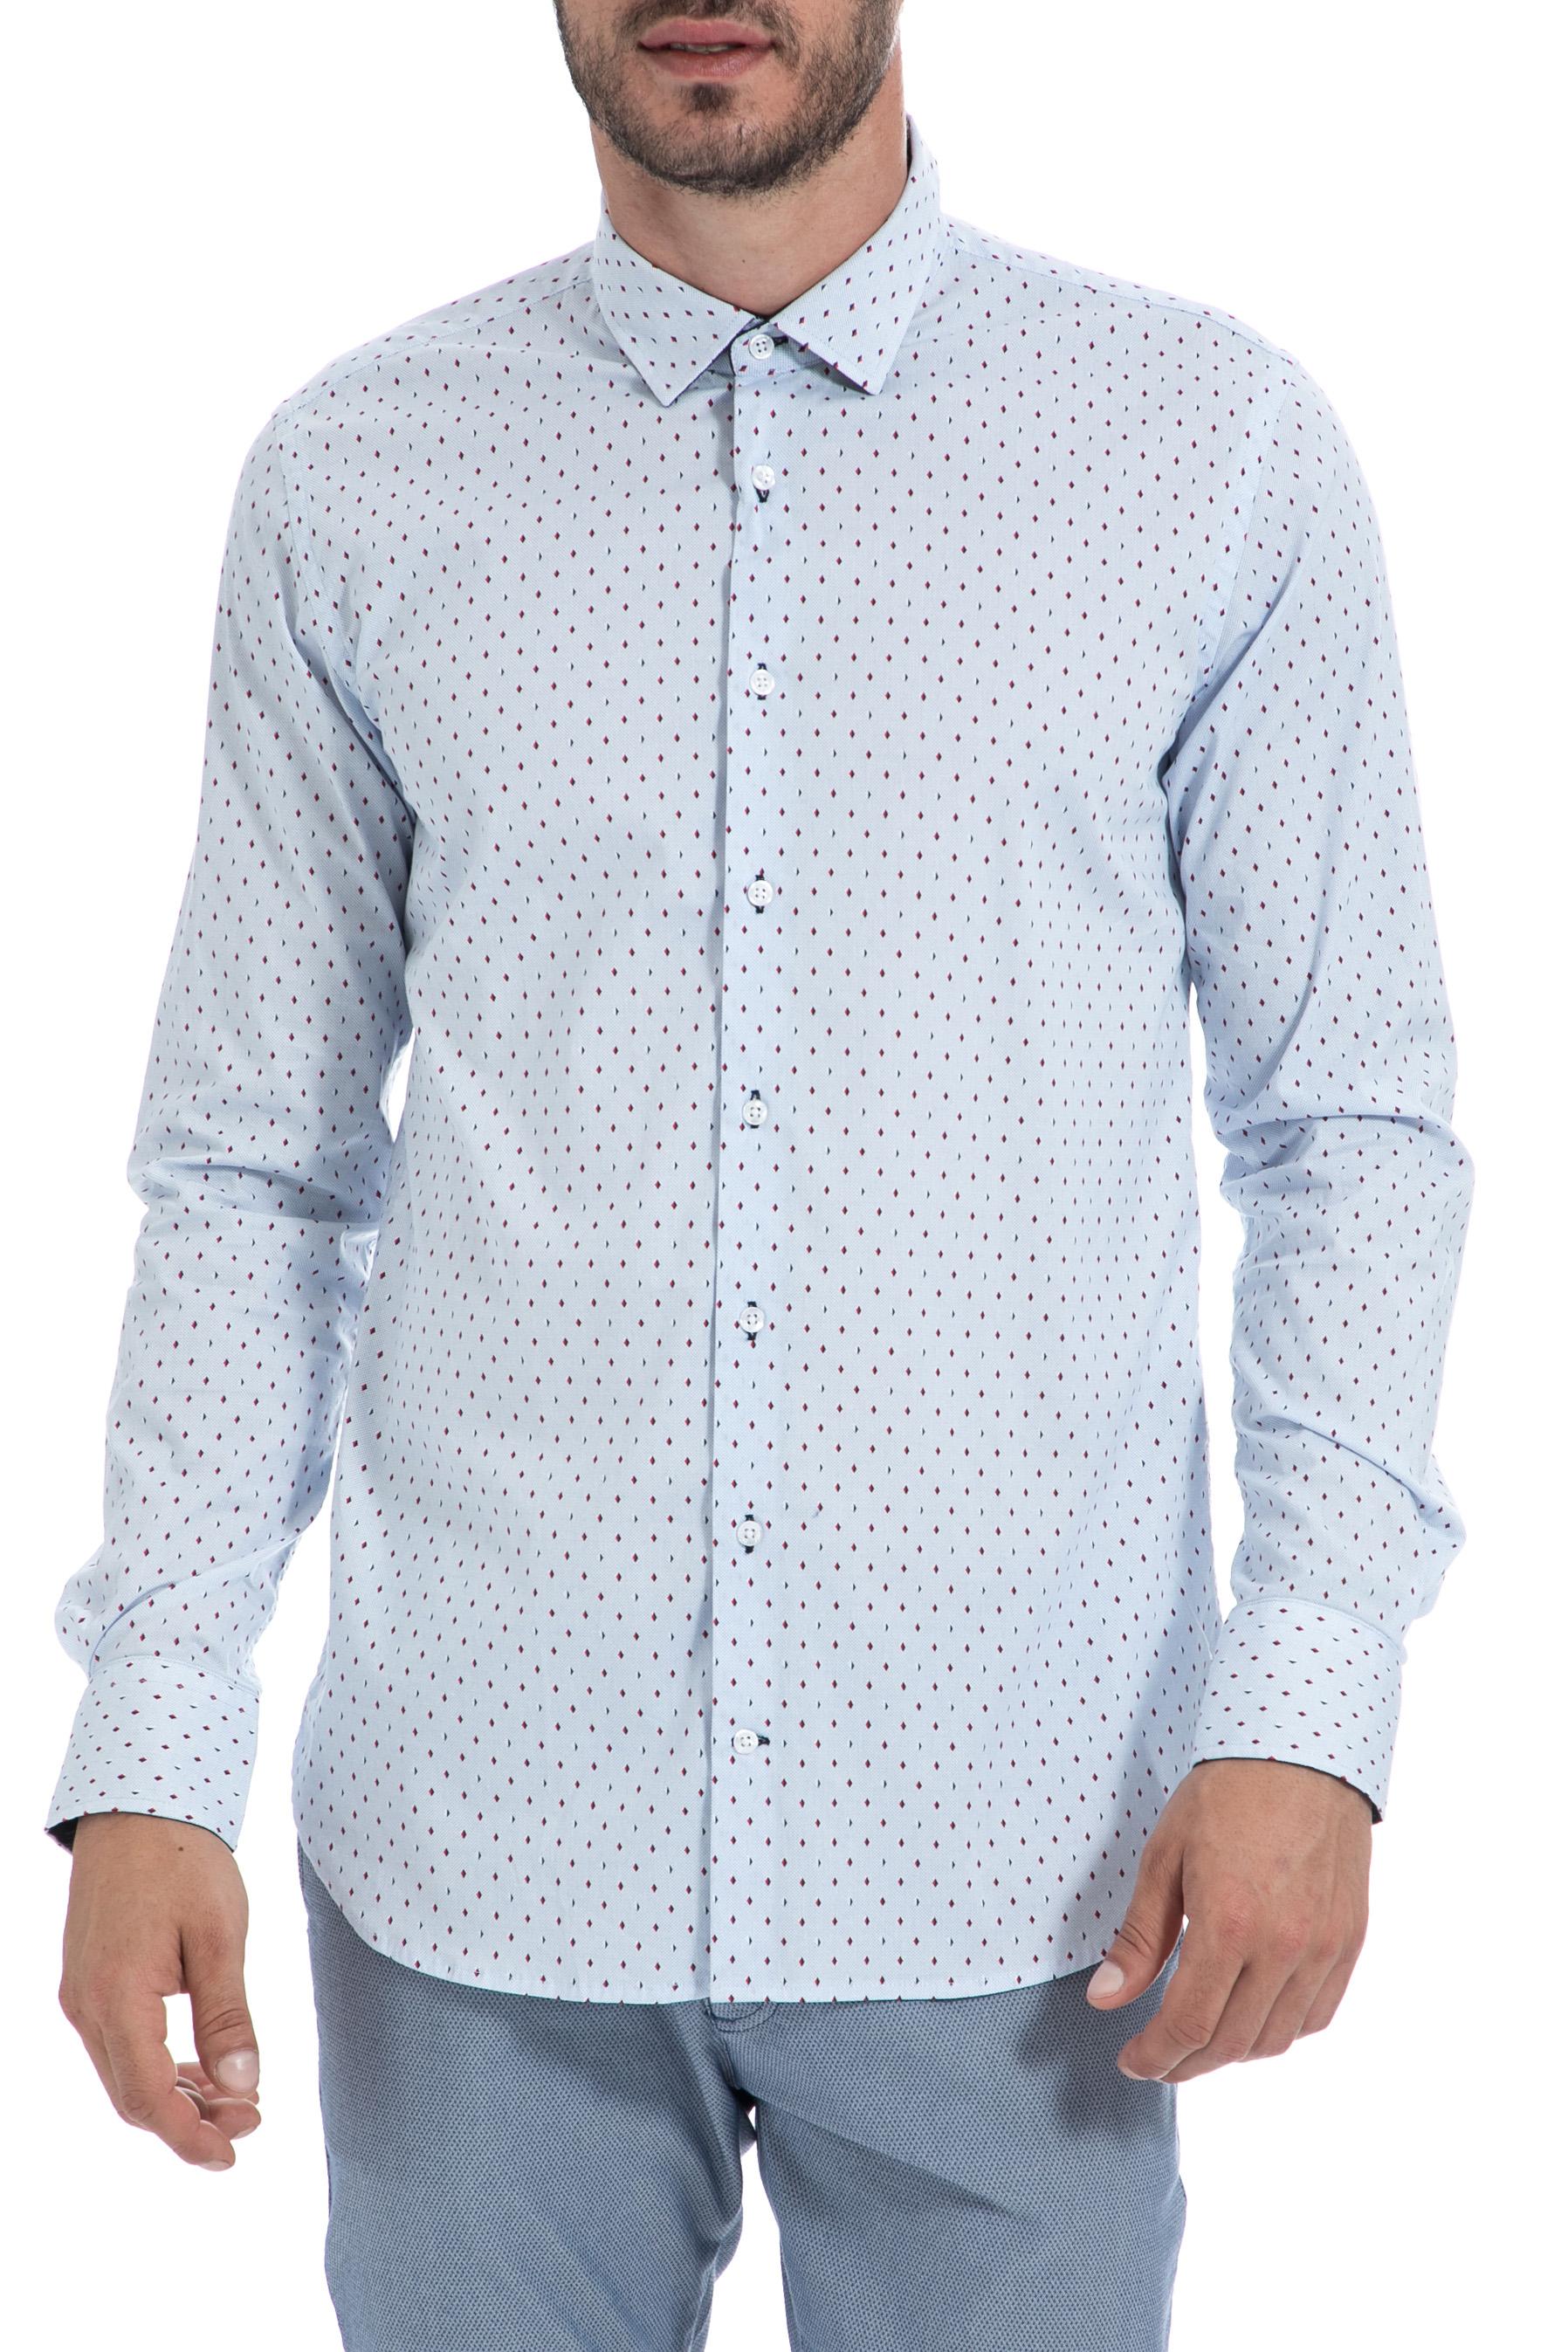 05b60aeed94 SSEINSE - Ανδρικό πουκάμισο SSEINSE γαλάζιο